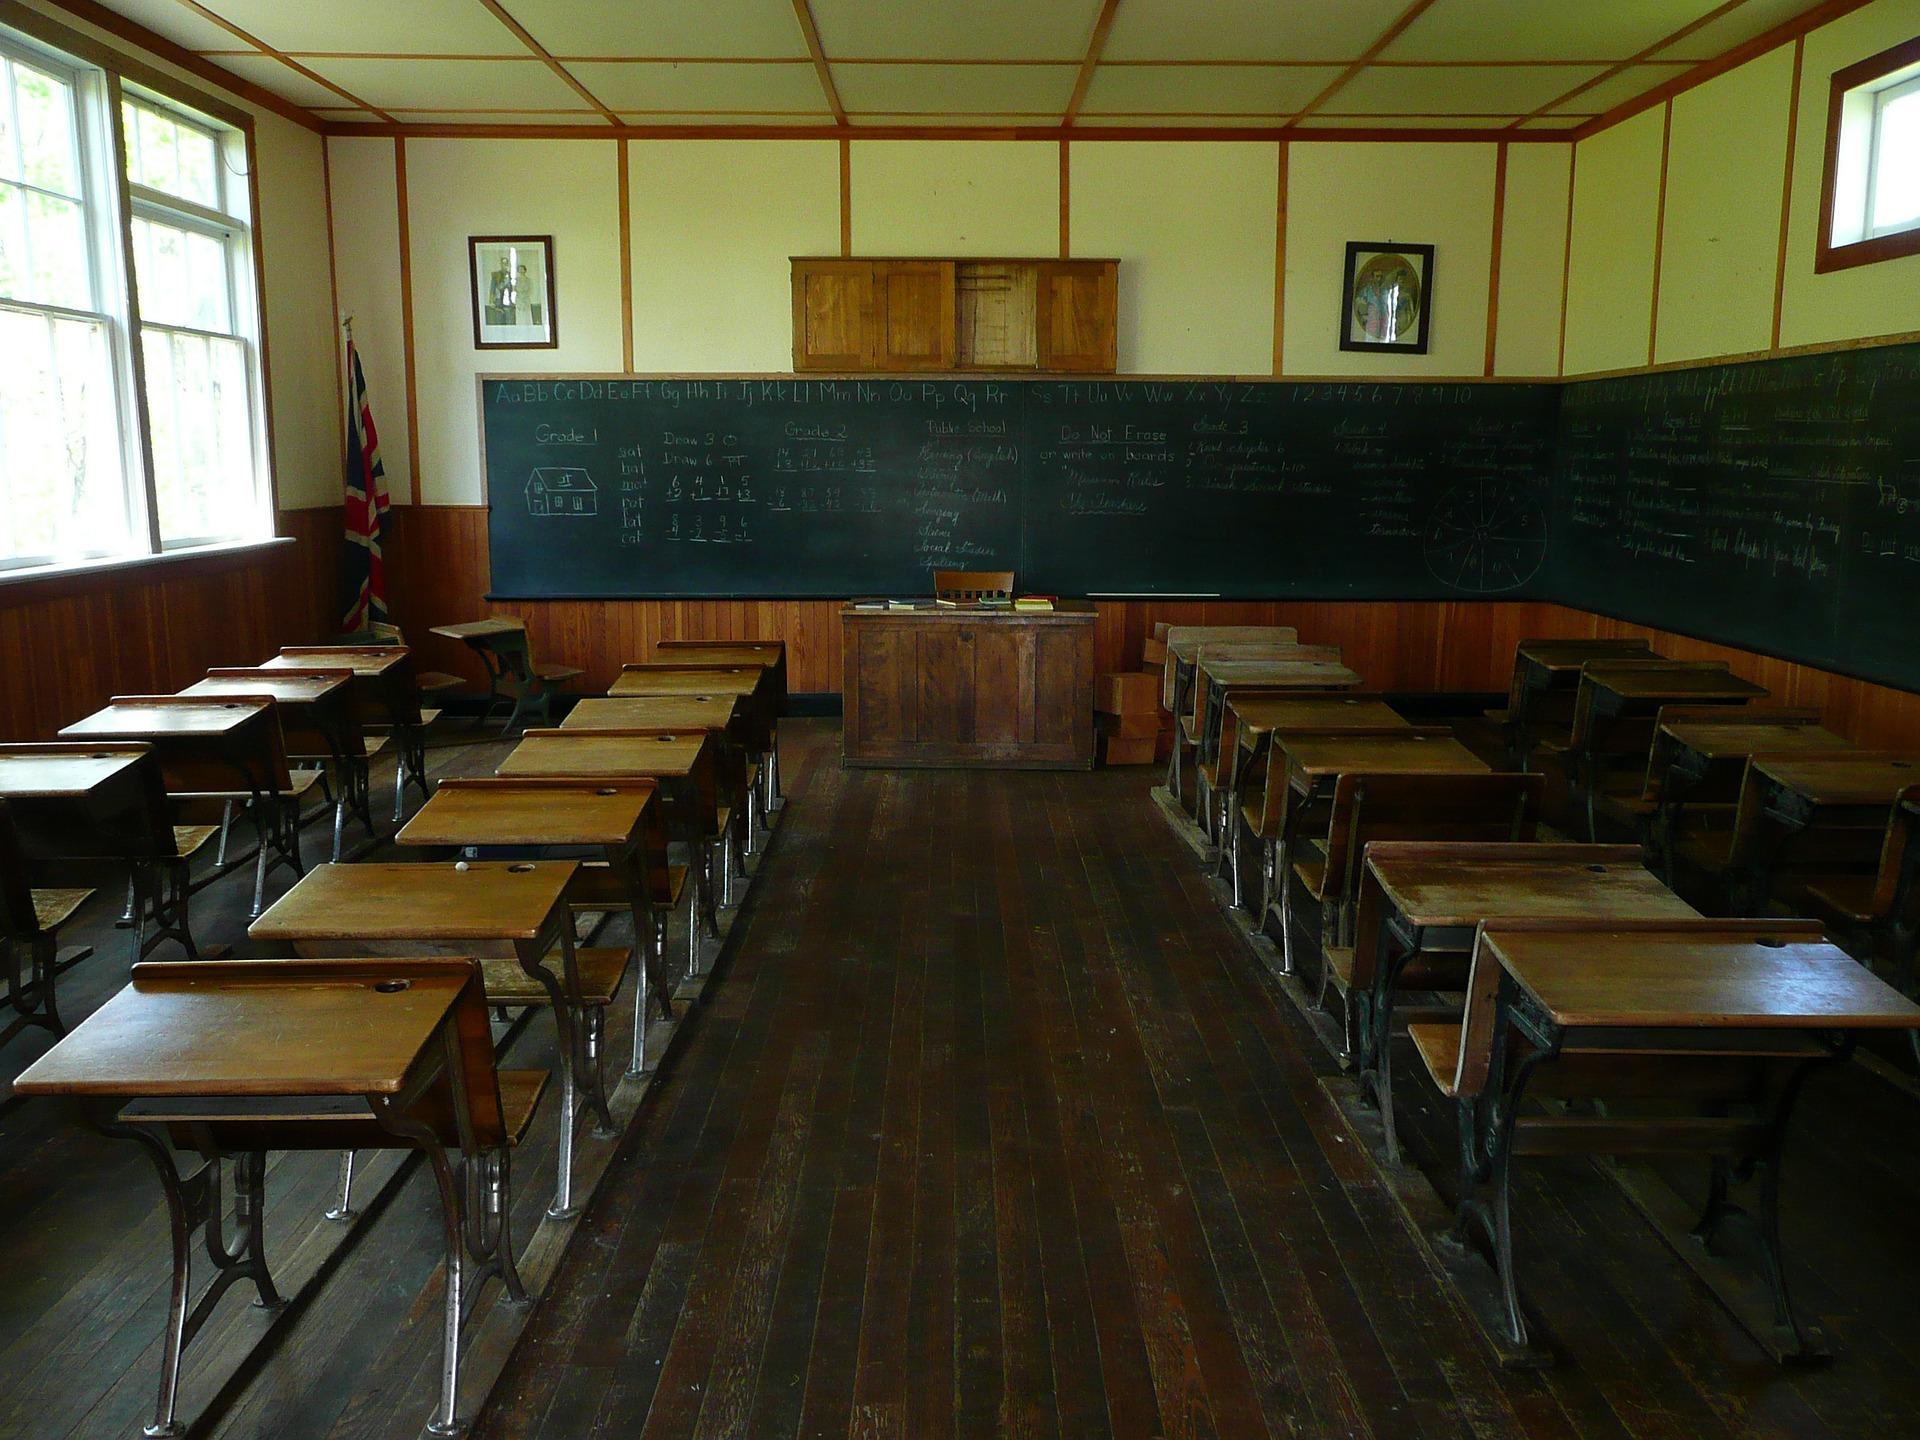 Maloljetnik pucao po dvorištu škole u Slavonskom Brodu